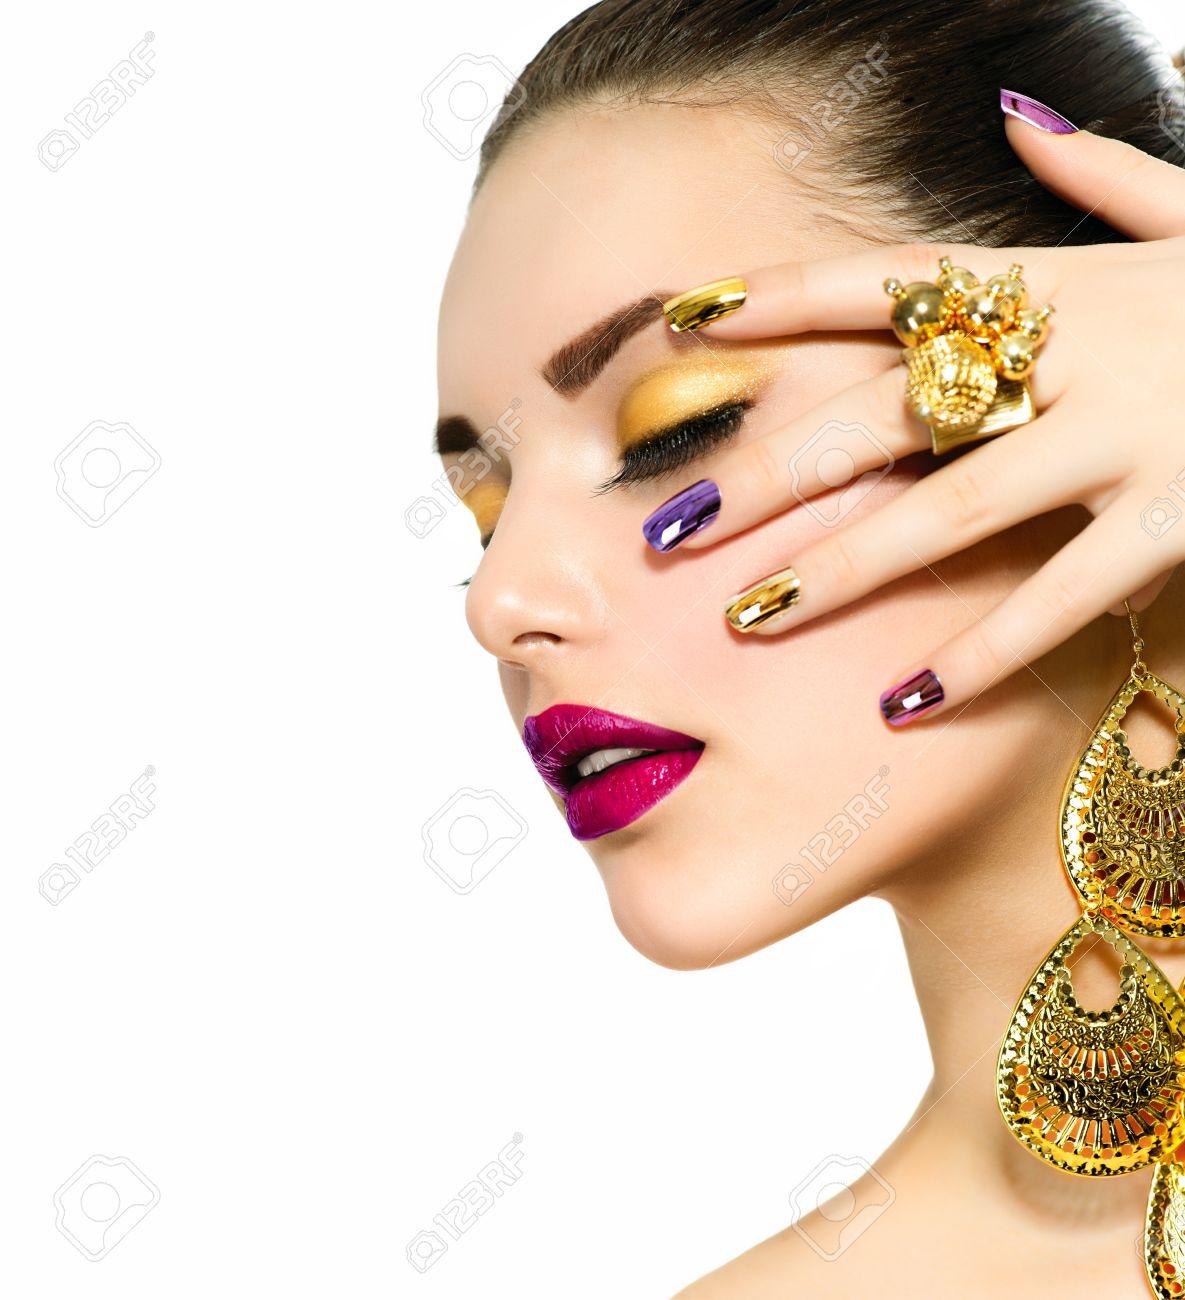 Fashion Beauty Manicure And Make Up Nail Art Stock Photo Picture